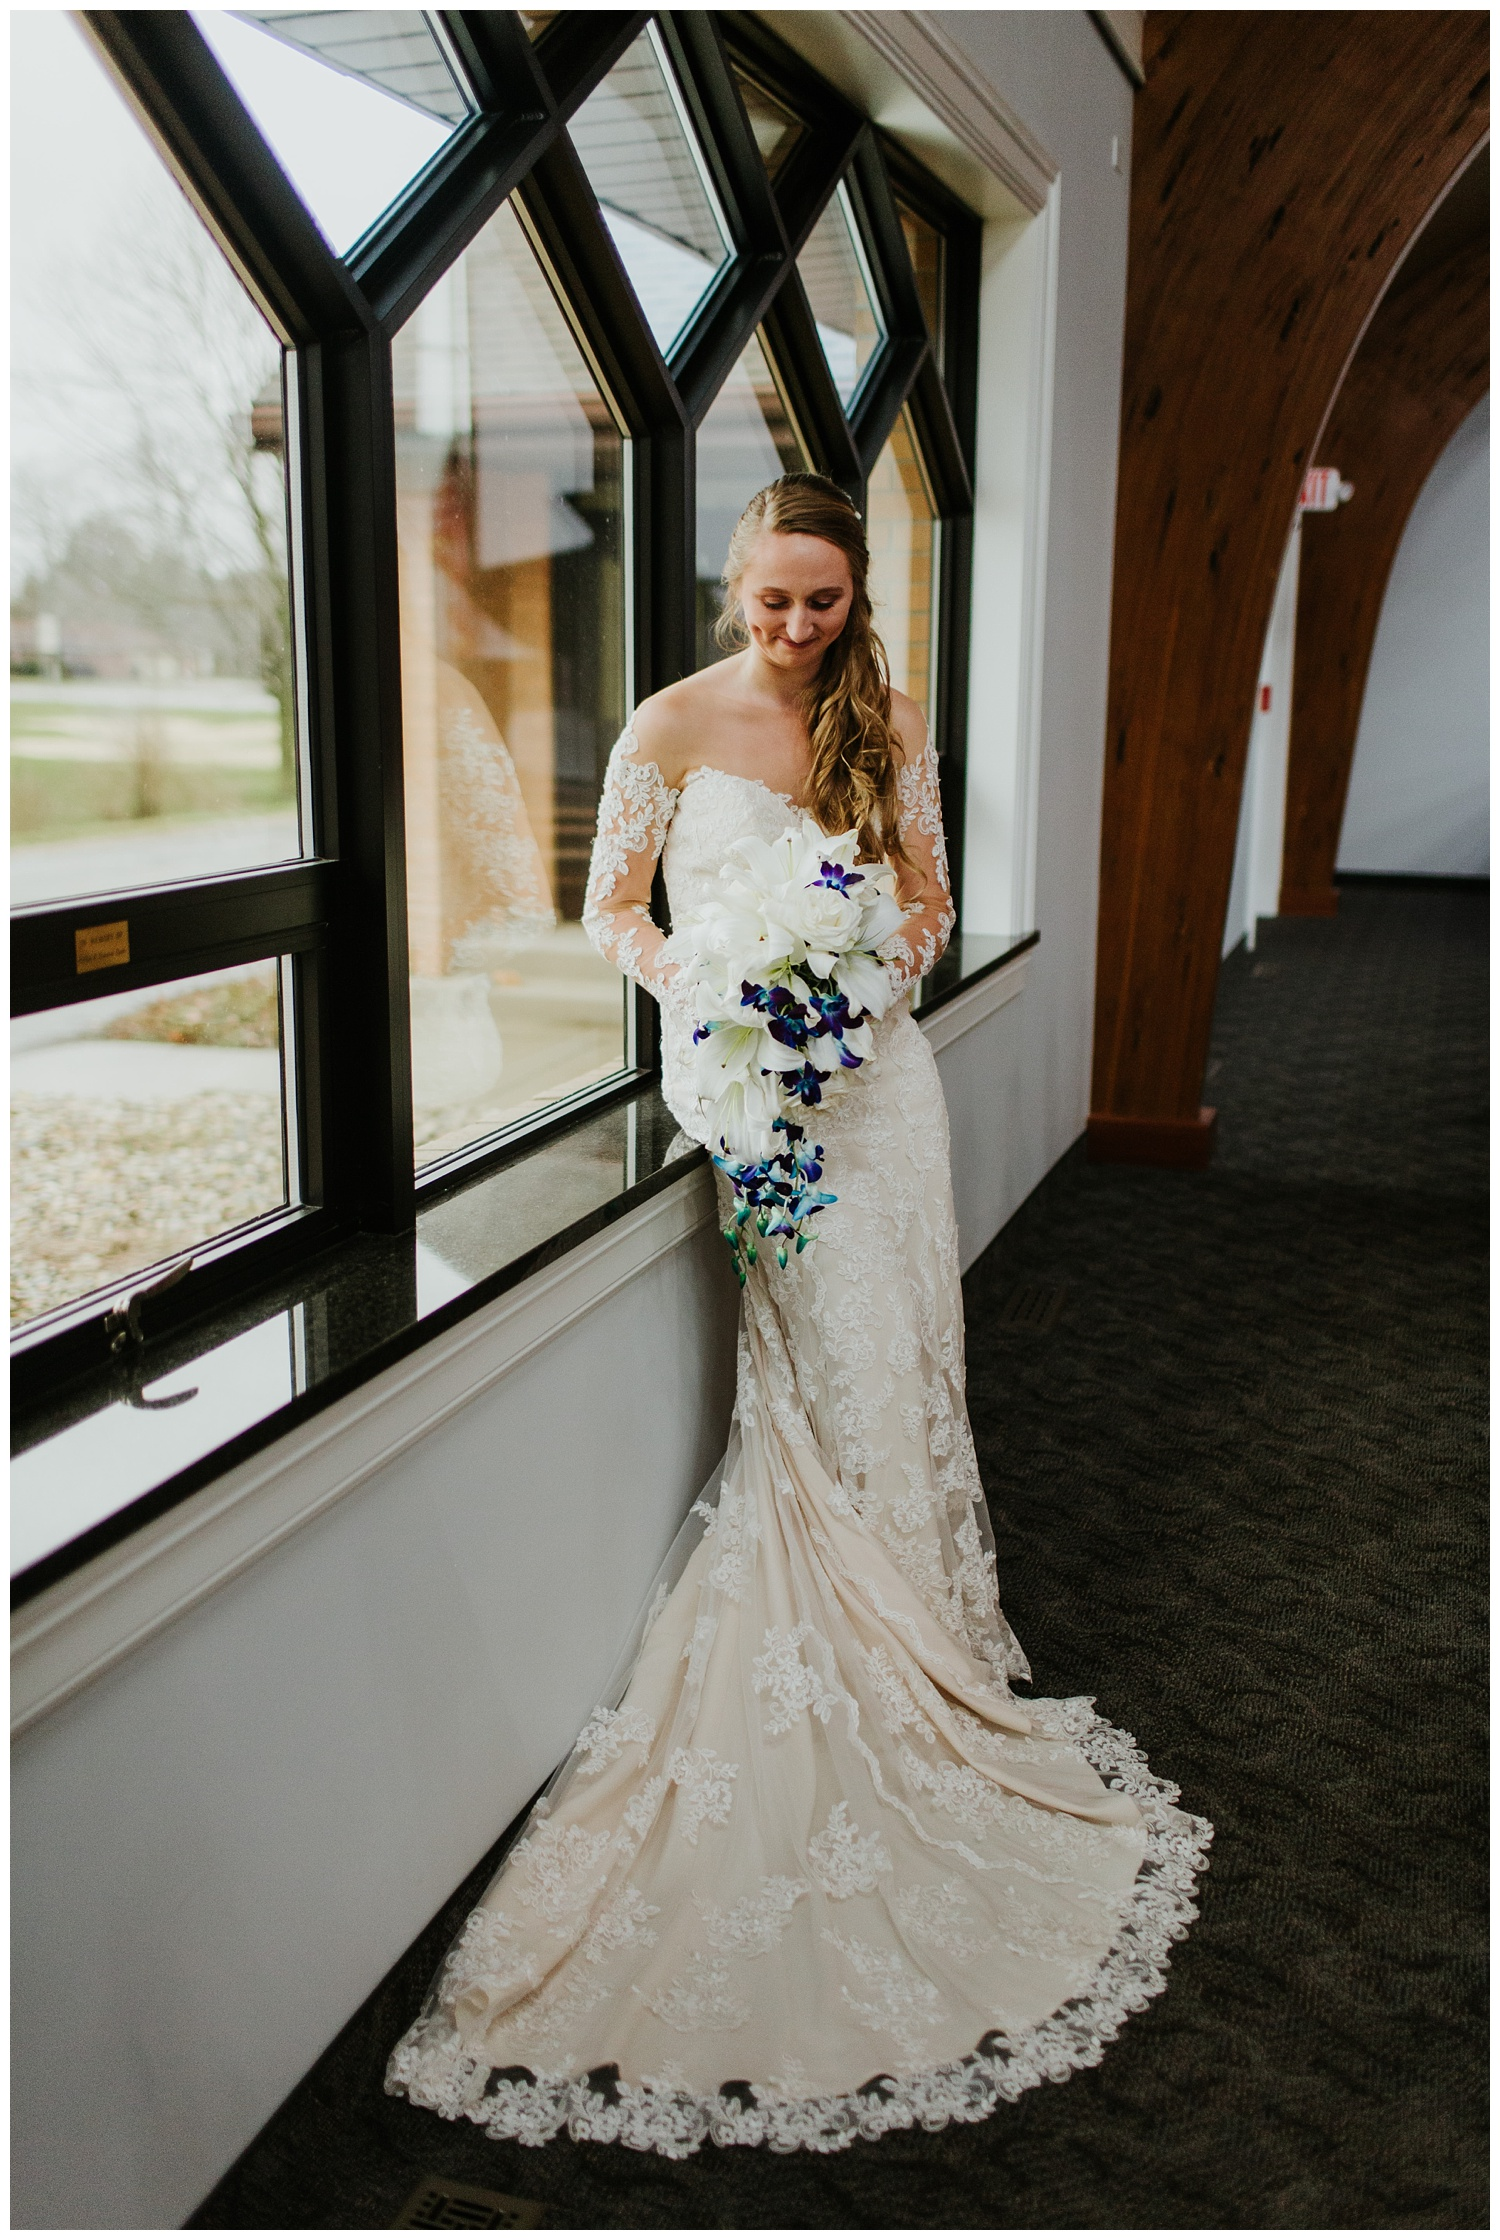 Shadowland Silver Beach St. Joseph Wedding Photographer Rainy Wedding47.jpg